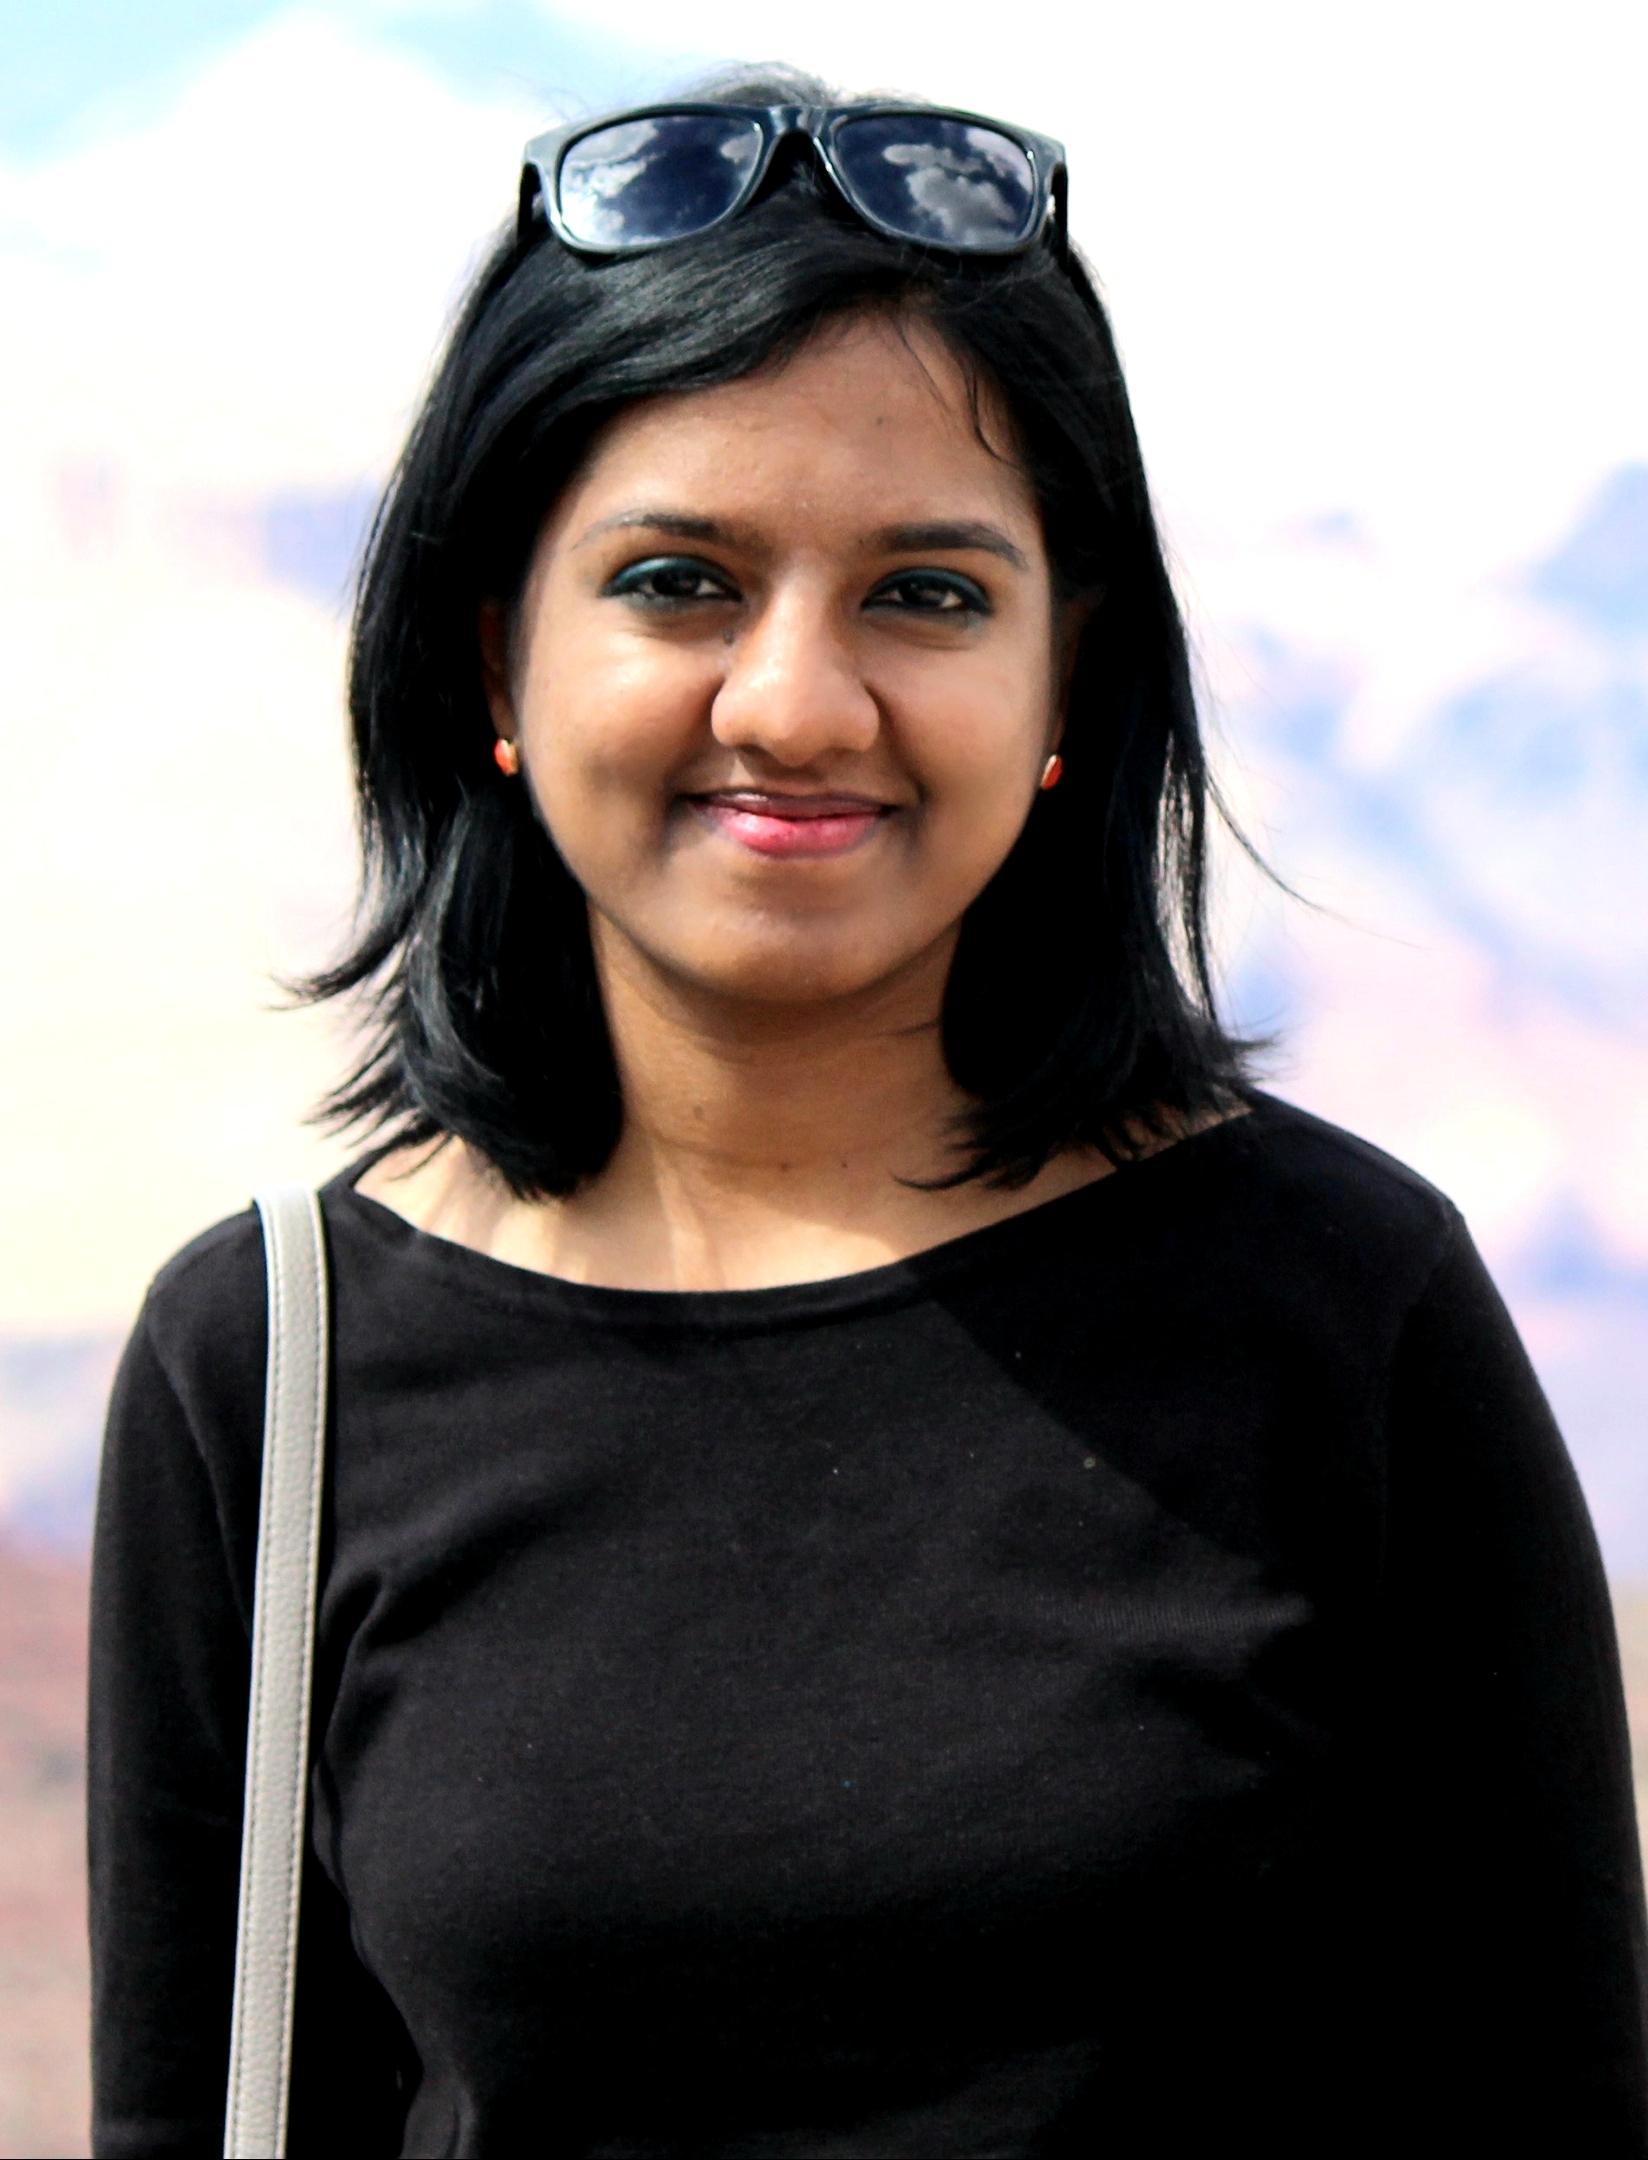 Subhashree Radhakrishnan